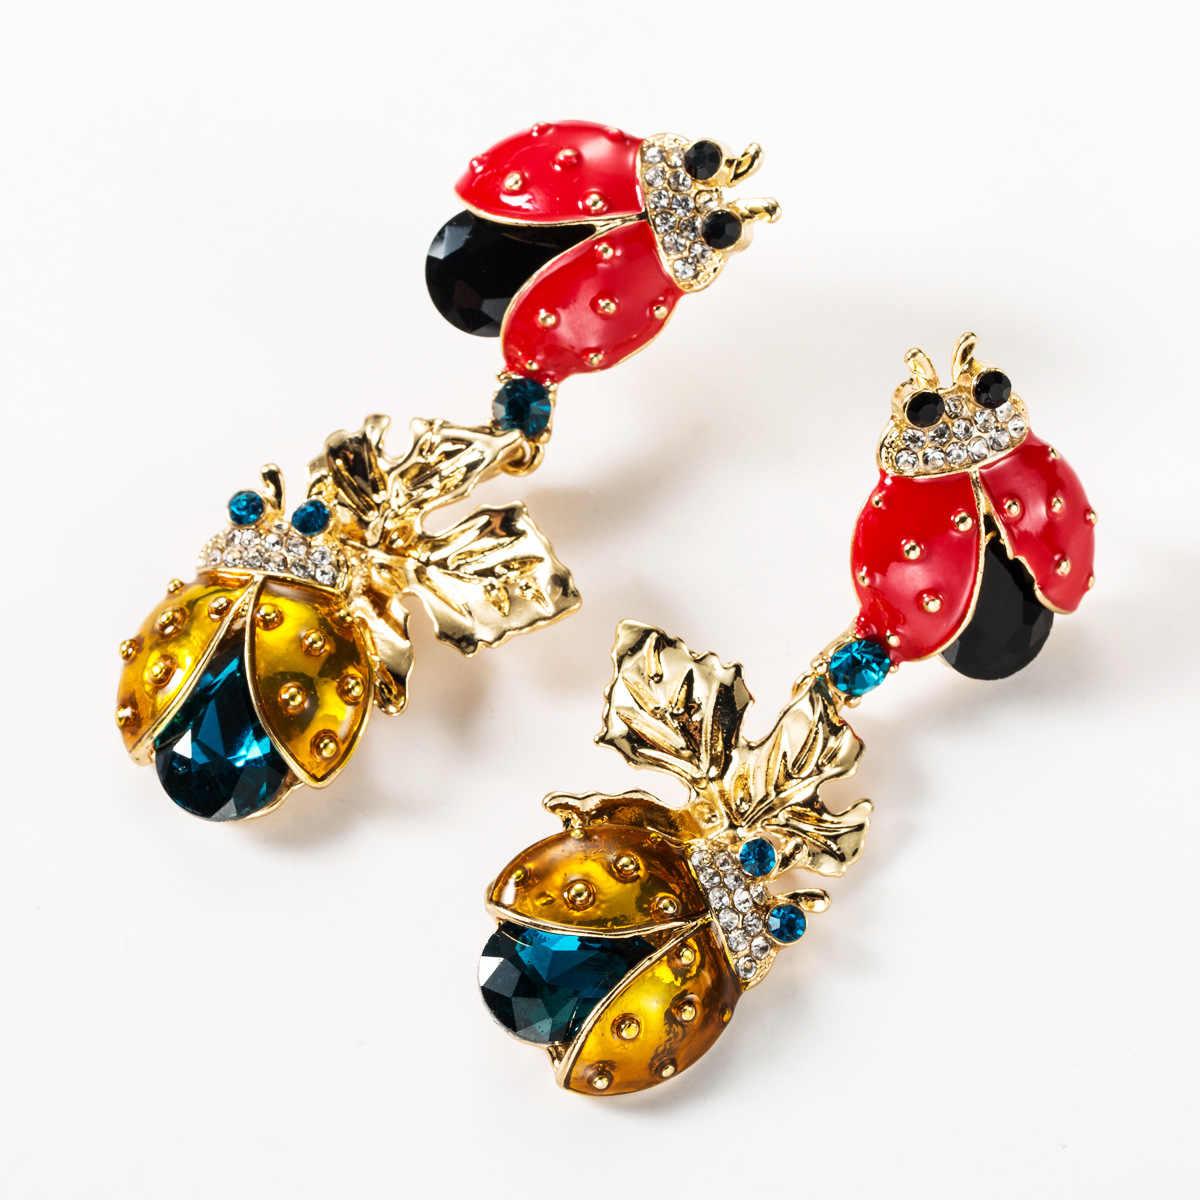 925 Perak Pin Fashion Berlebihan Ladybug Anting-Anting Femme Punk Alloy Crystal Serangga Laporan Panjang Drop Anting-Anting Perhiasan Wanita